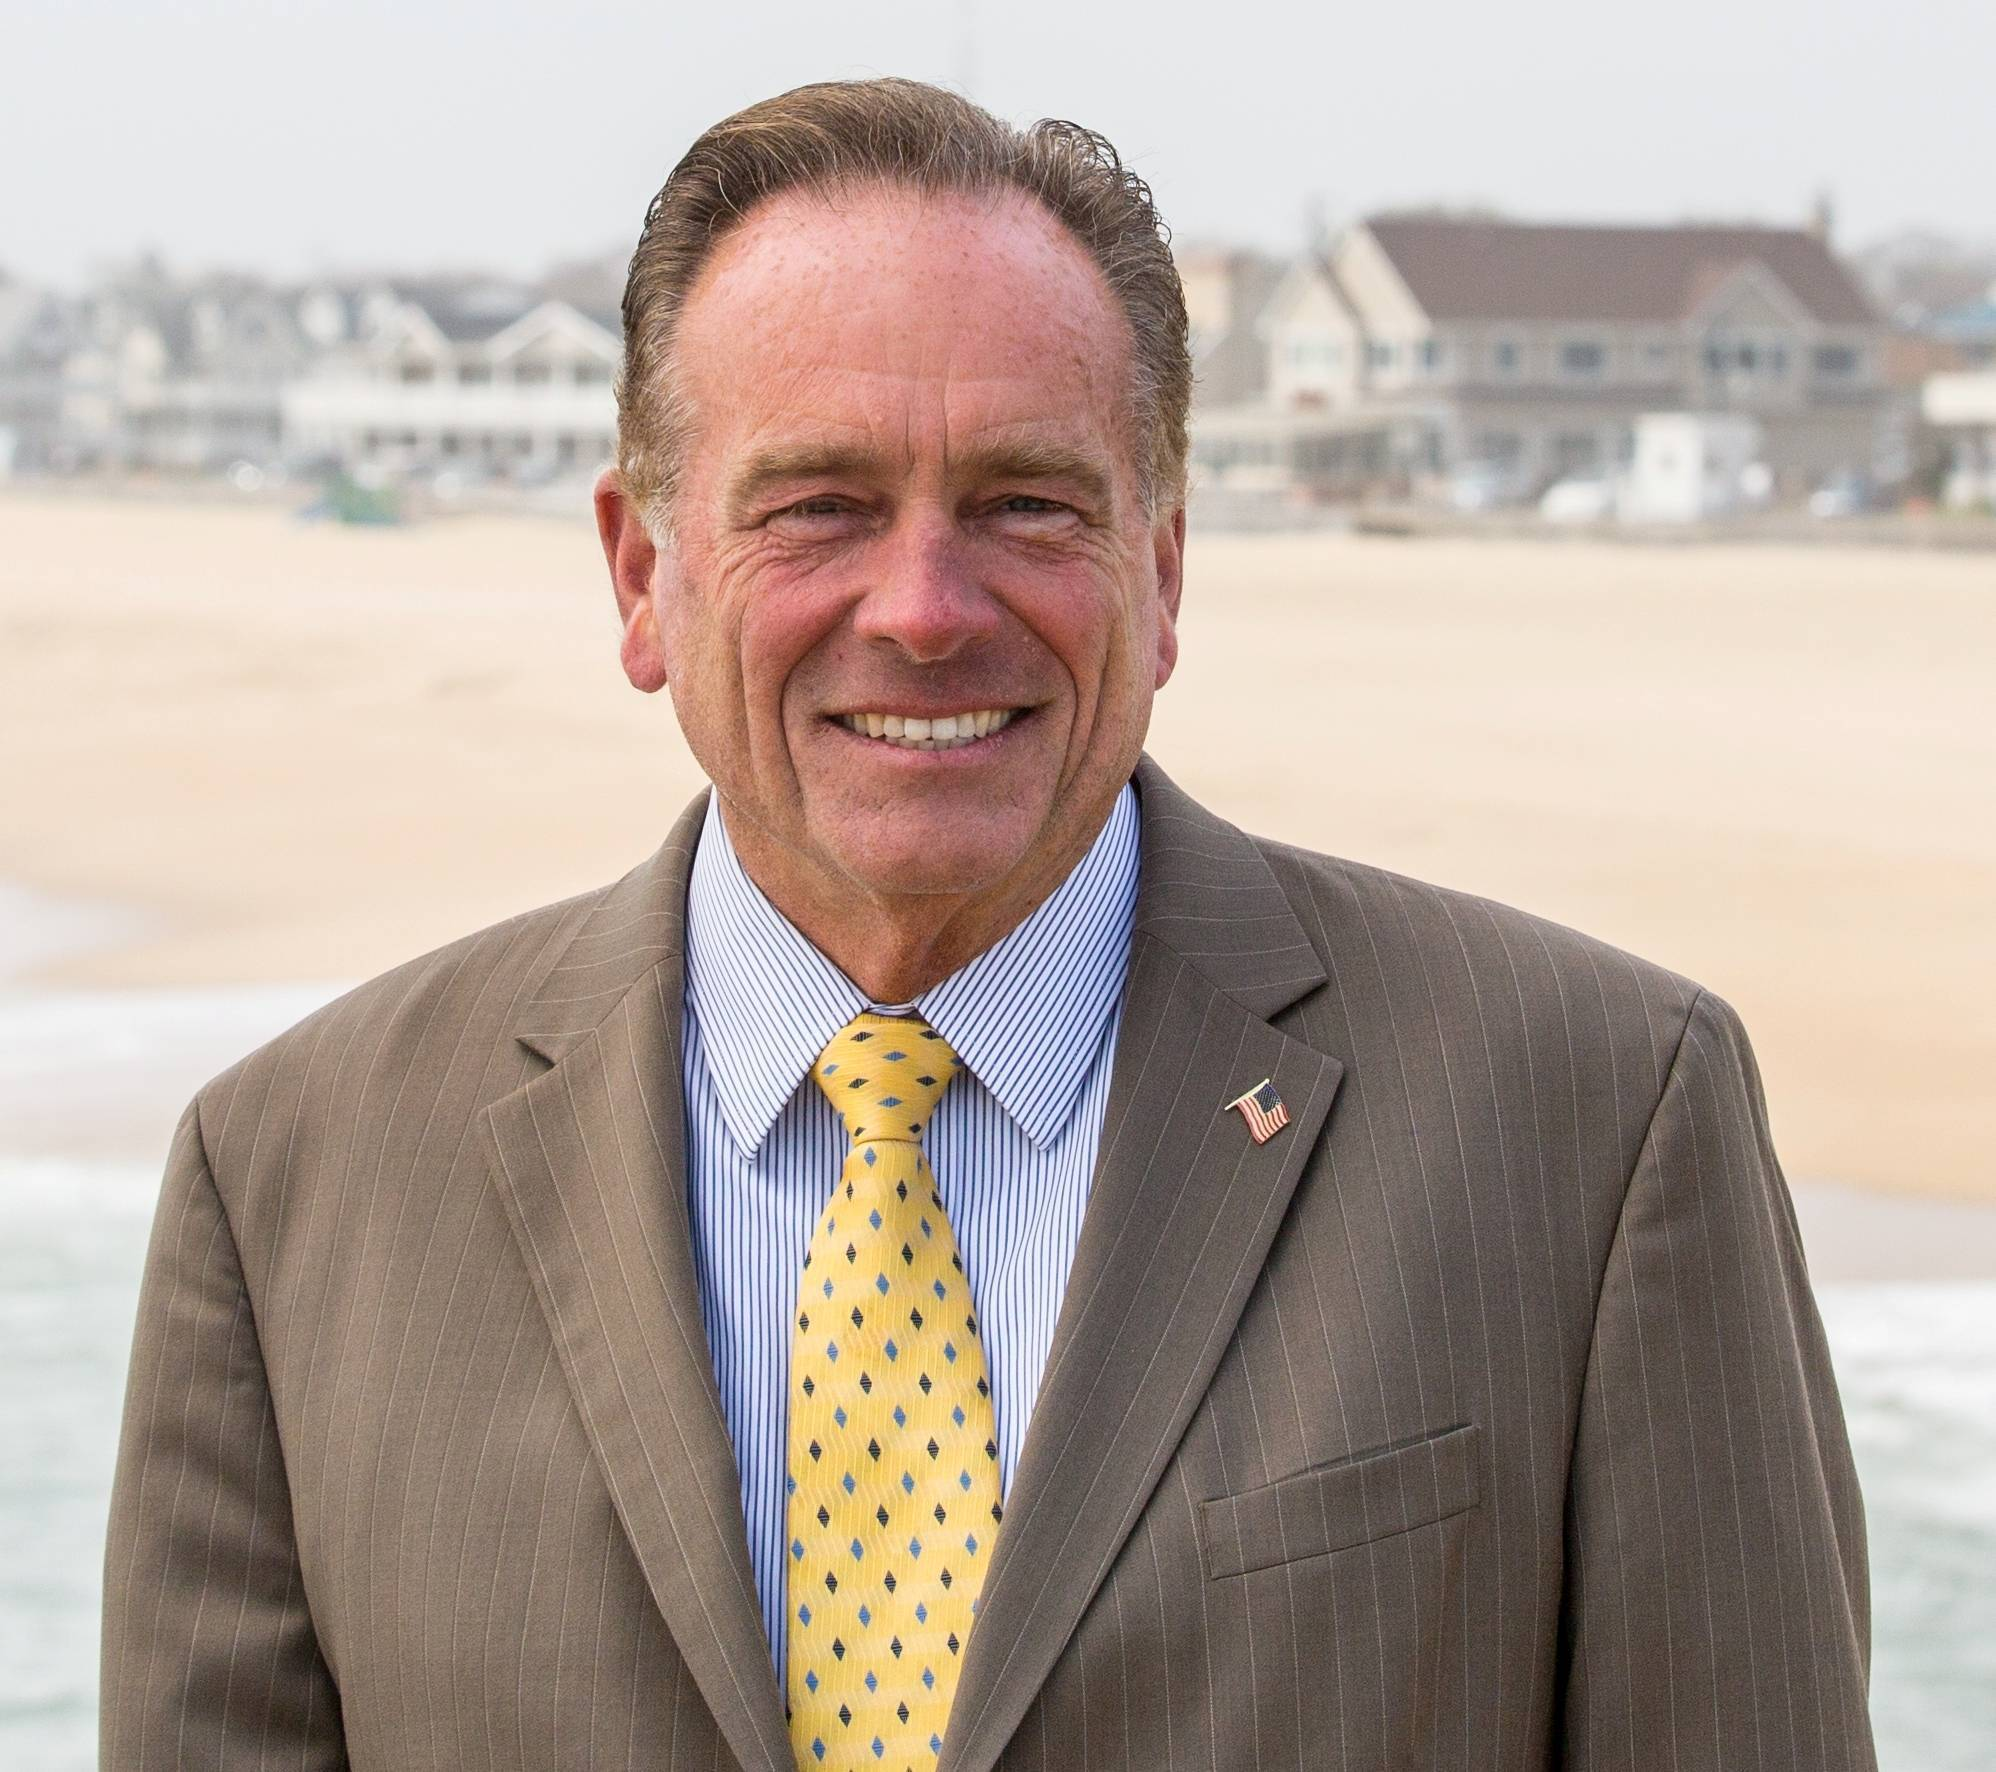 Councilman Mark Walsifer